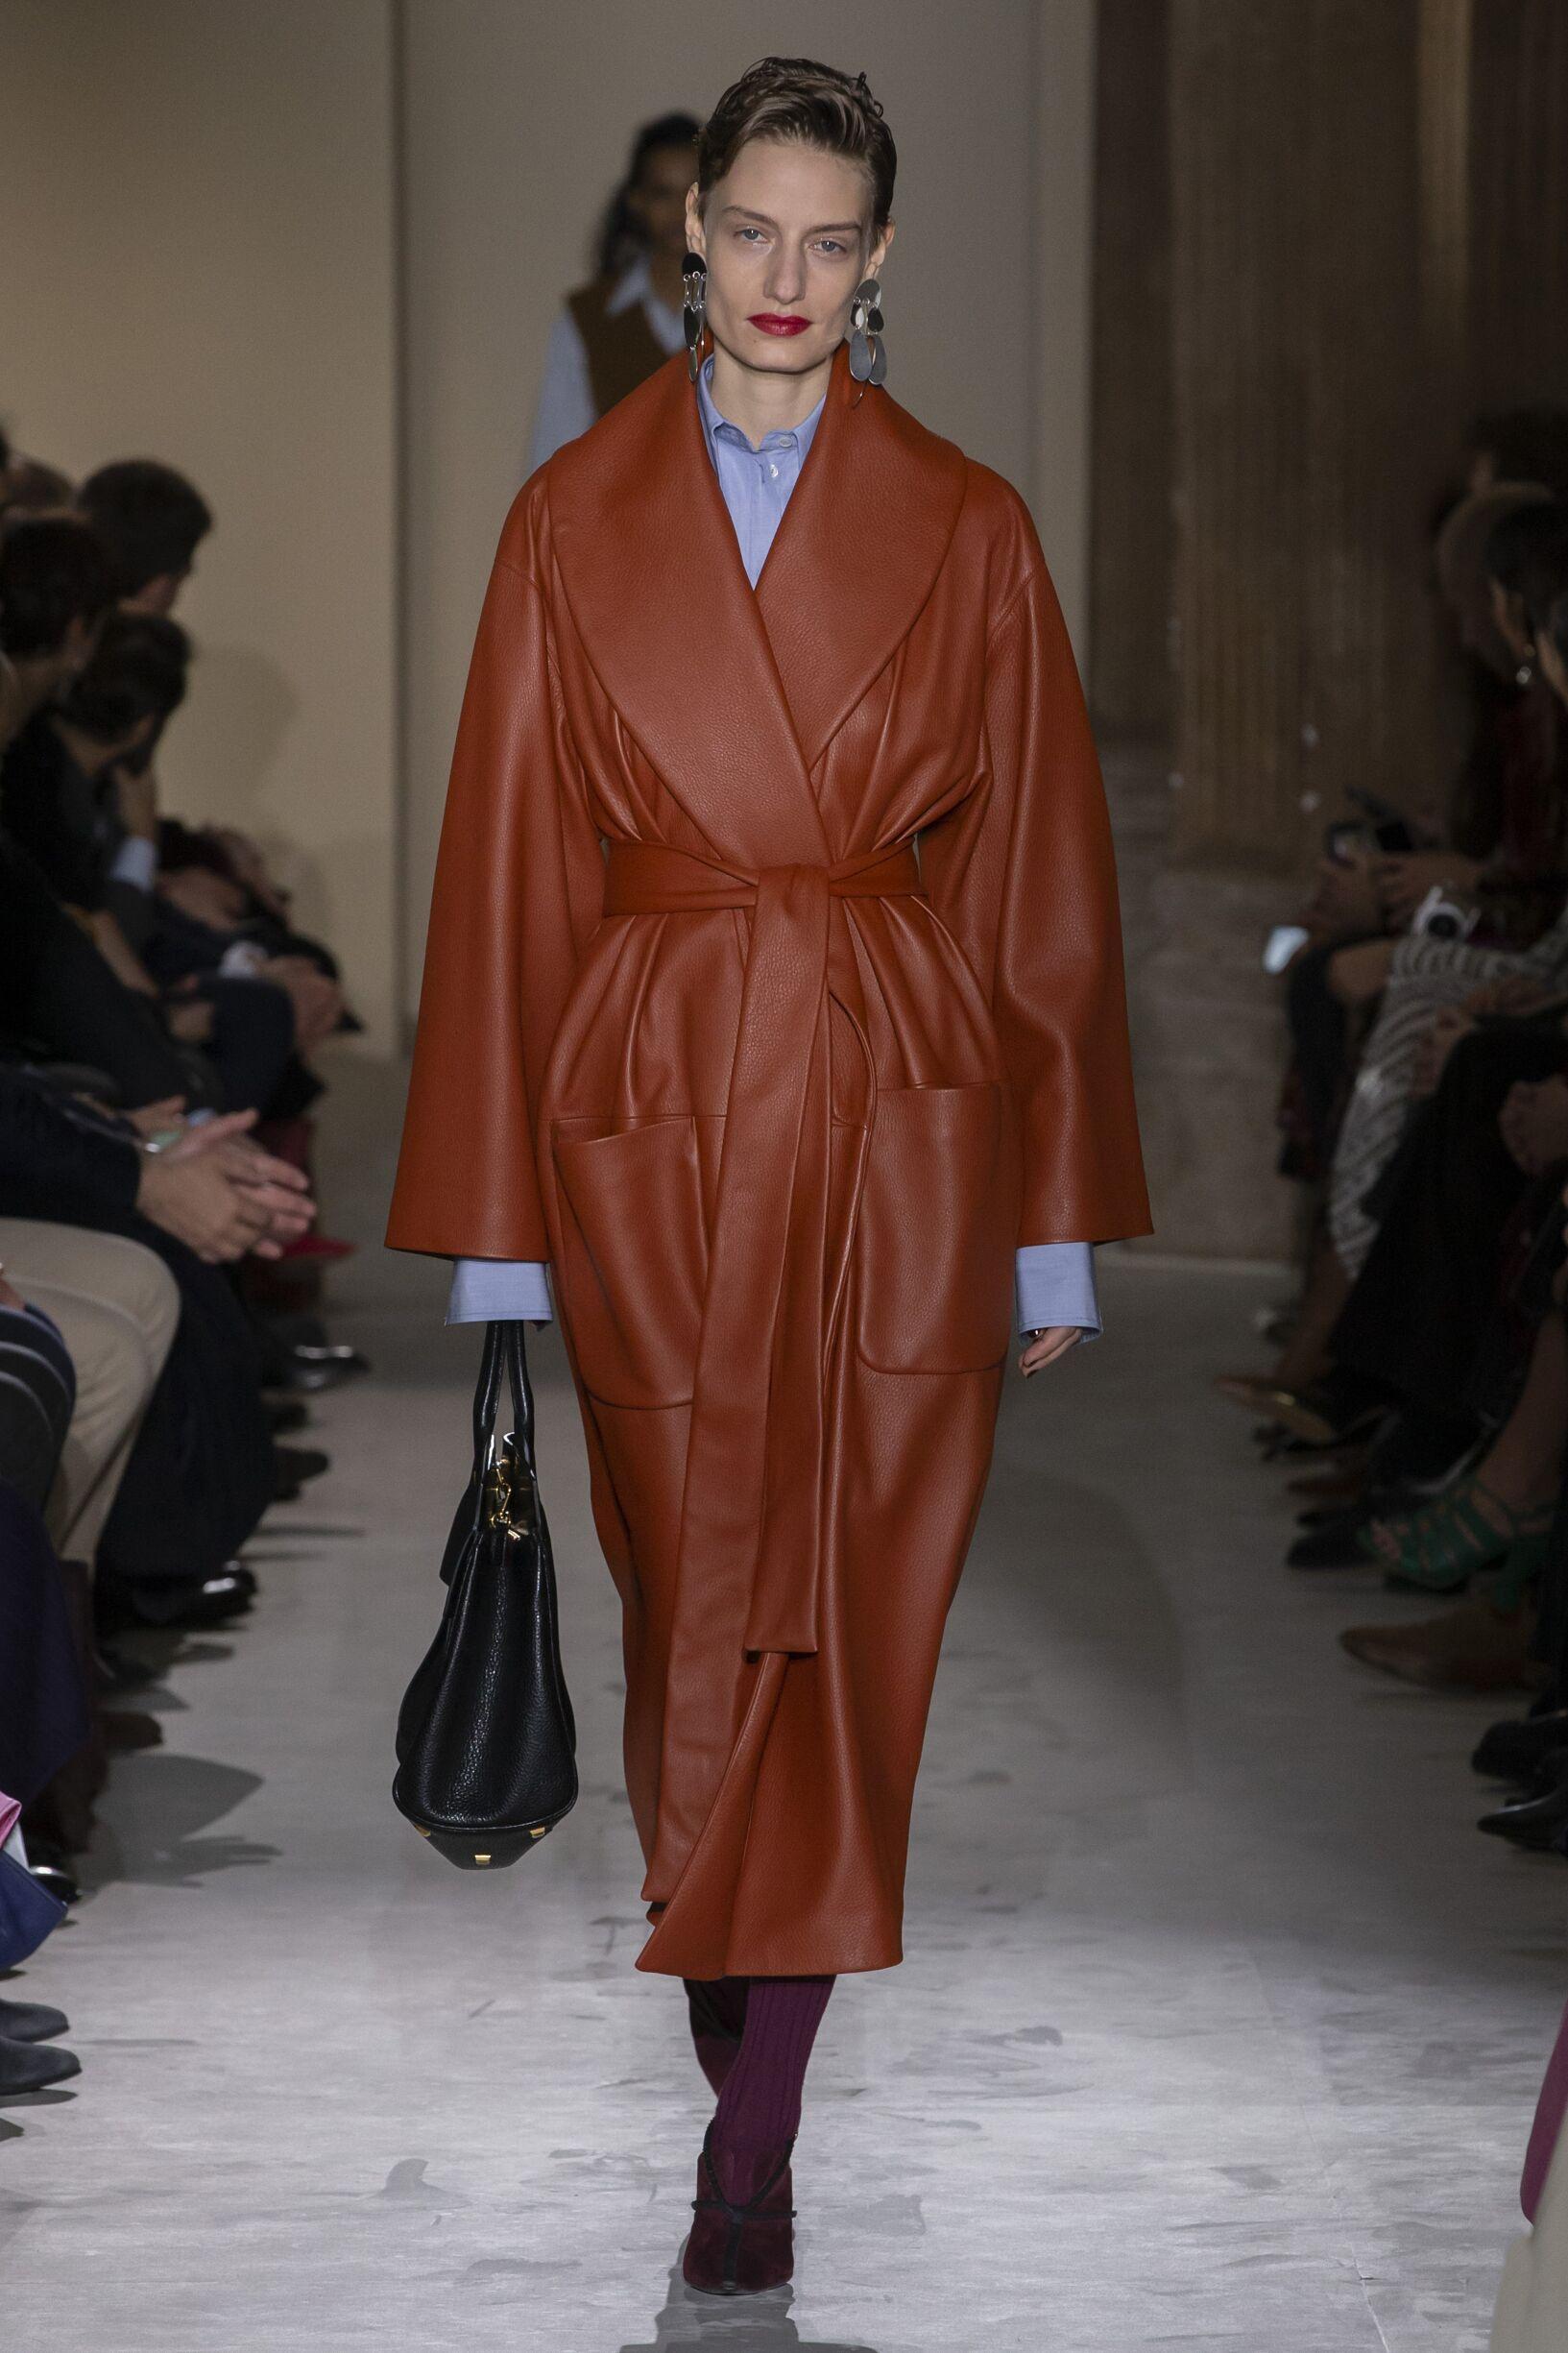 Catwalk Salvatore Ferragamo Women Fashion Show Winter 2019